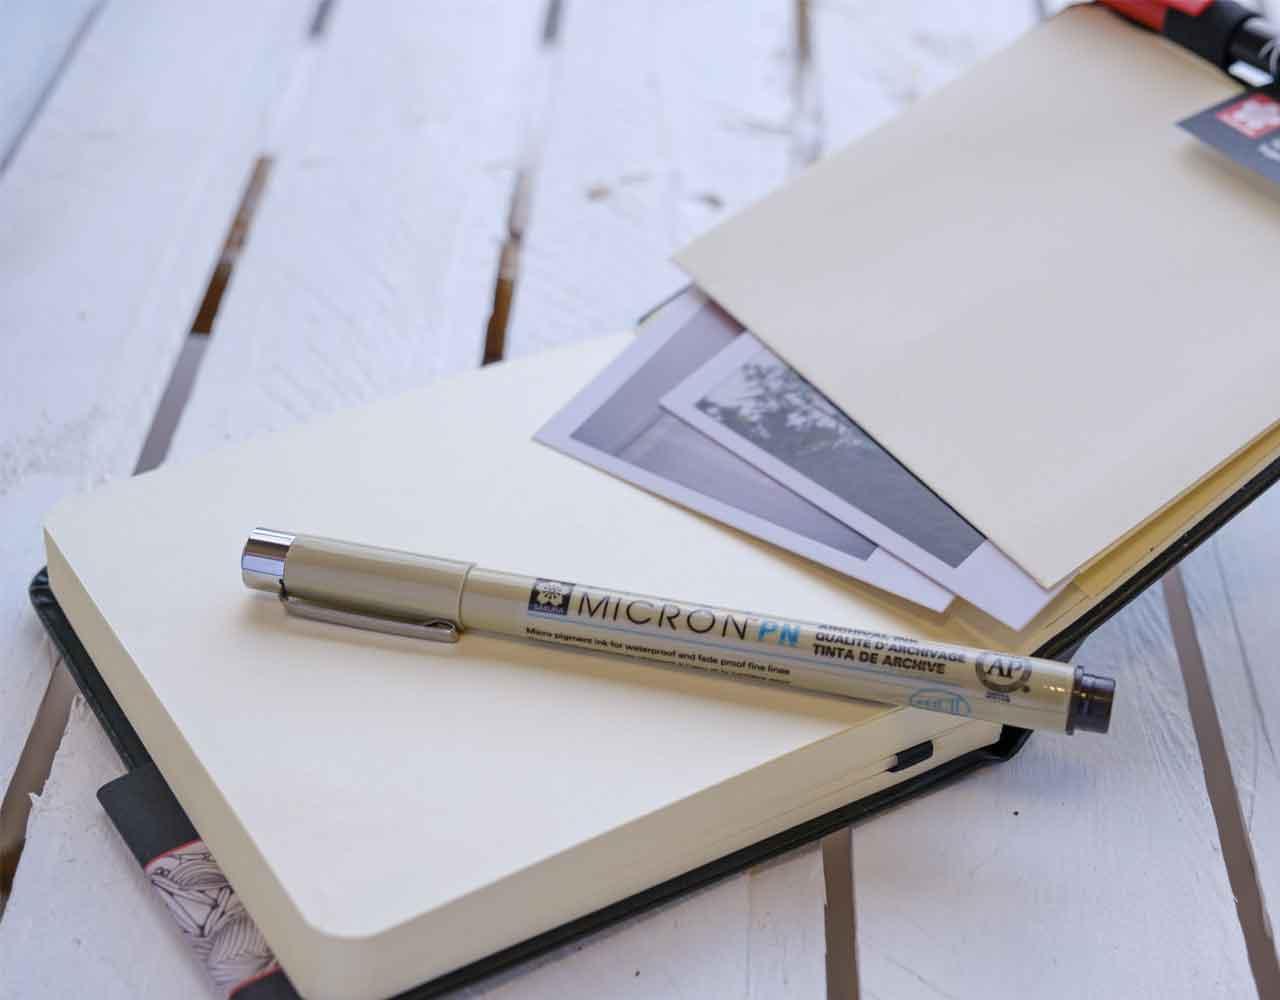 Sketchbook-Sxedio-Zografiki-Banner-Art&Colour